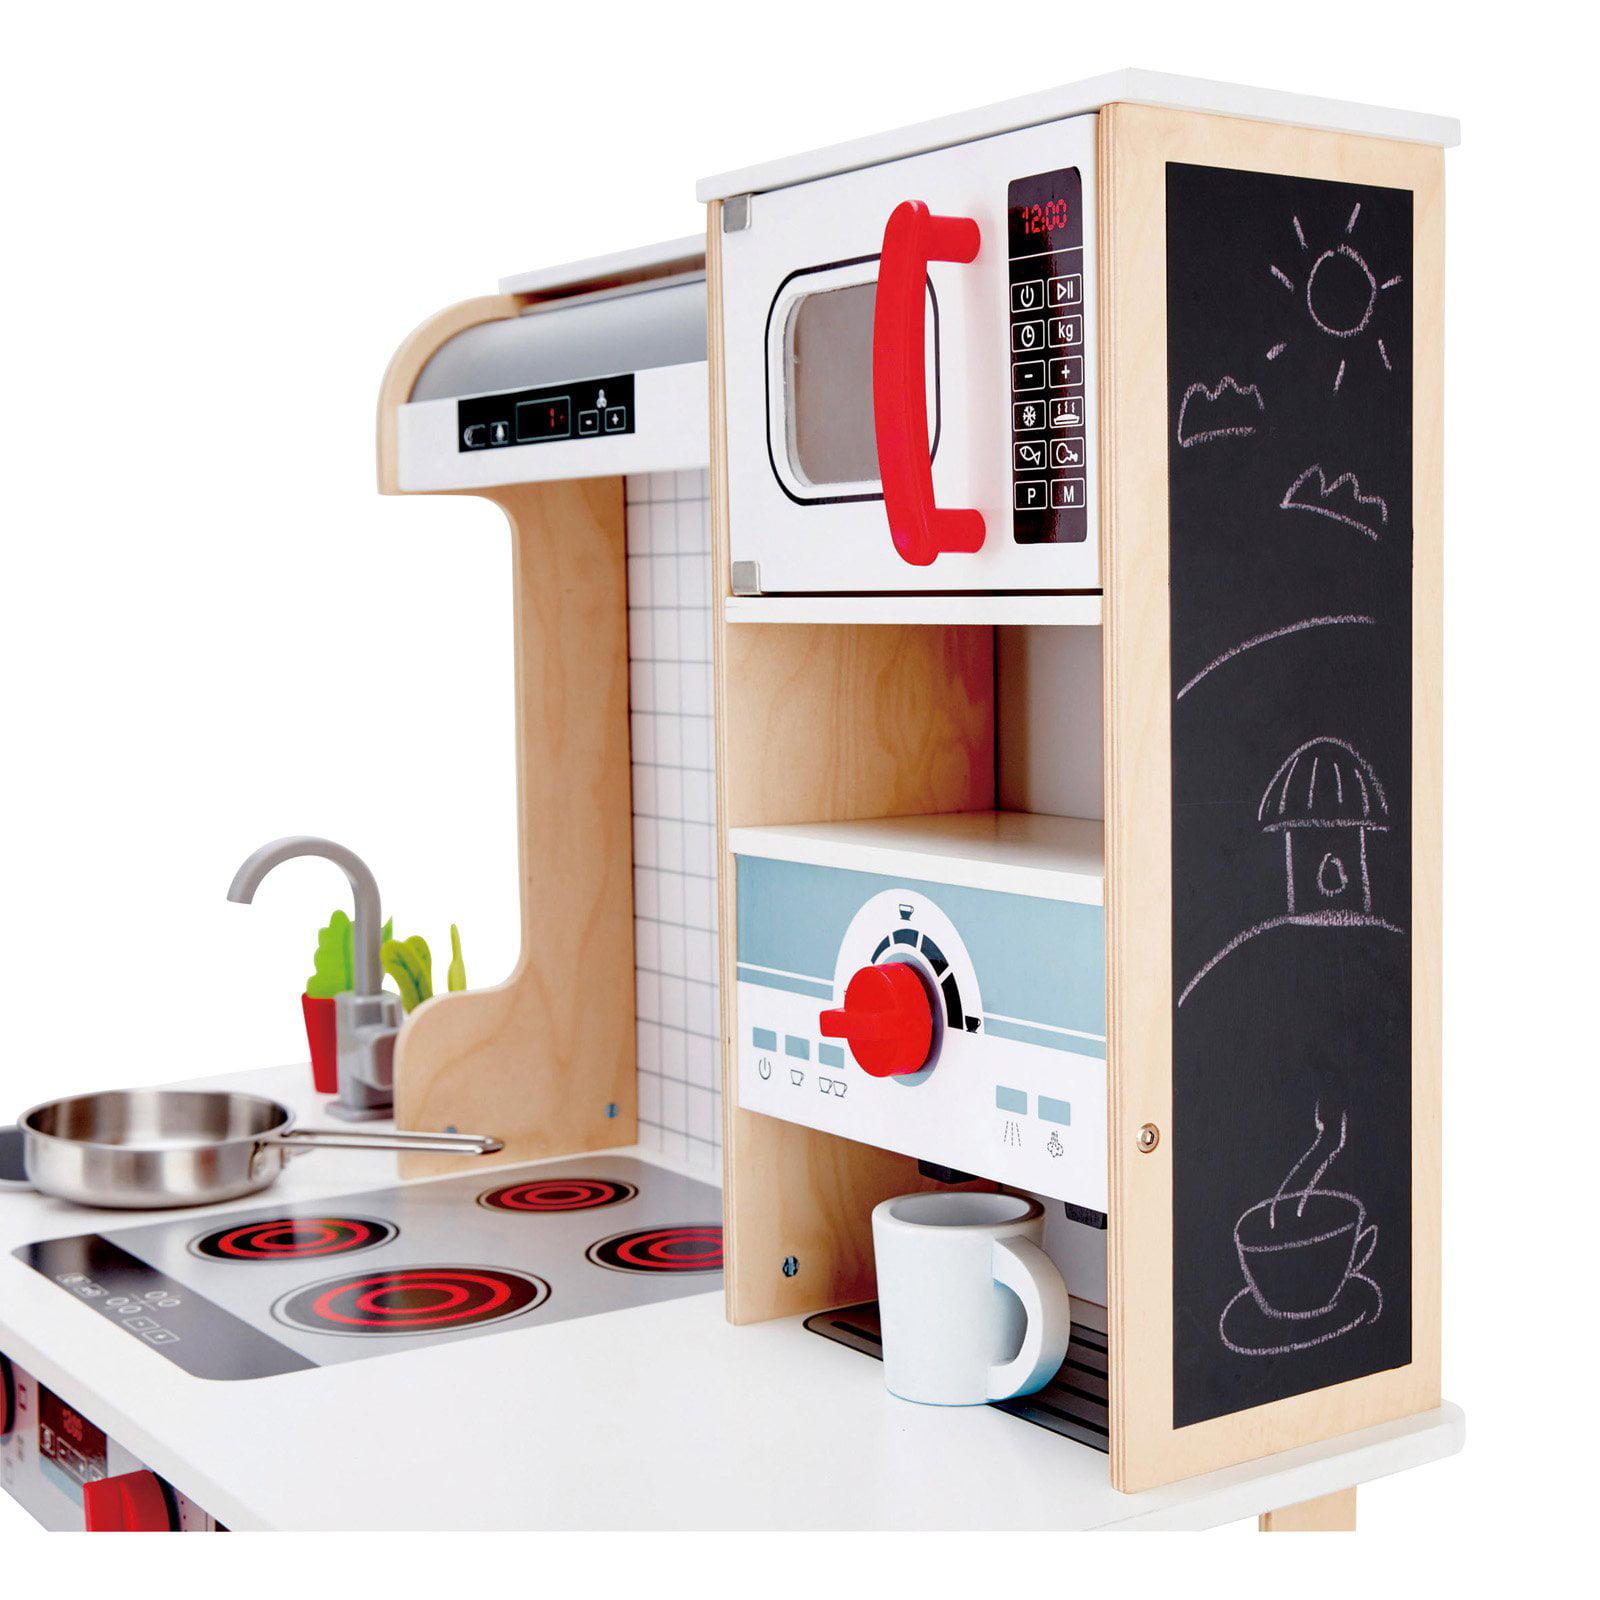 Hape All In 1 Kids Toddler Wooden Pretend Play Kitchen Set With 10 Accessories Walmart Com Walmart Com